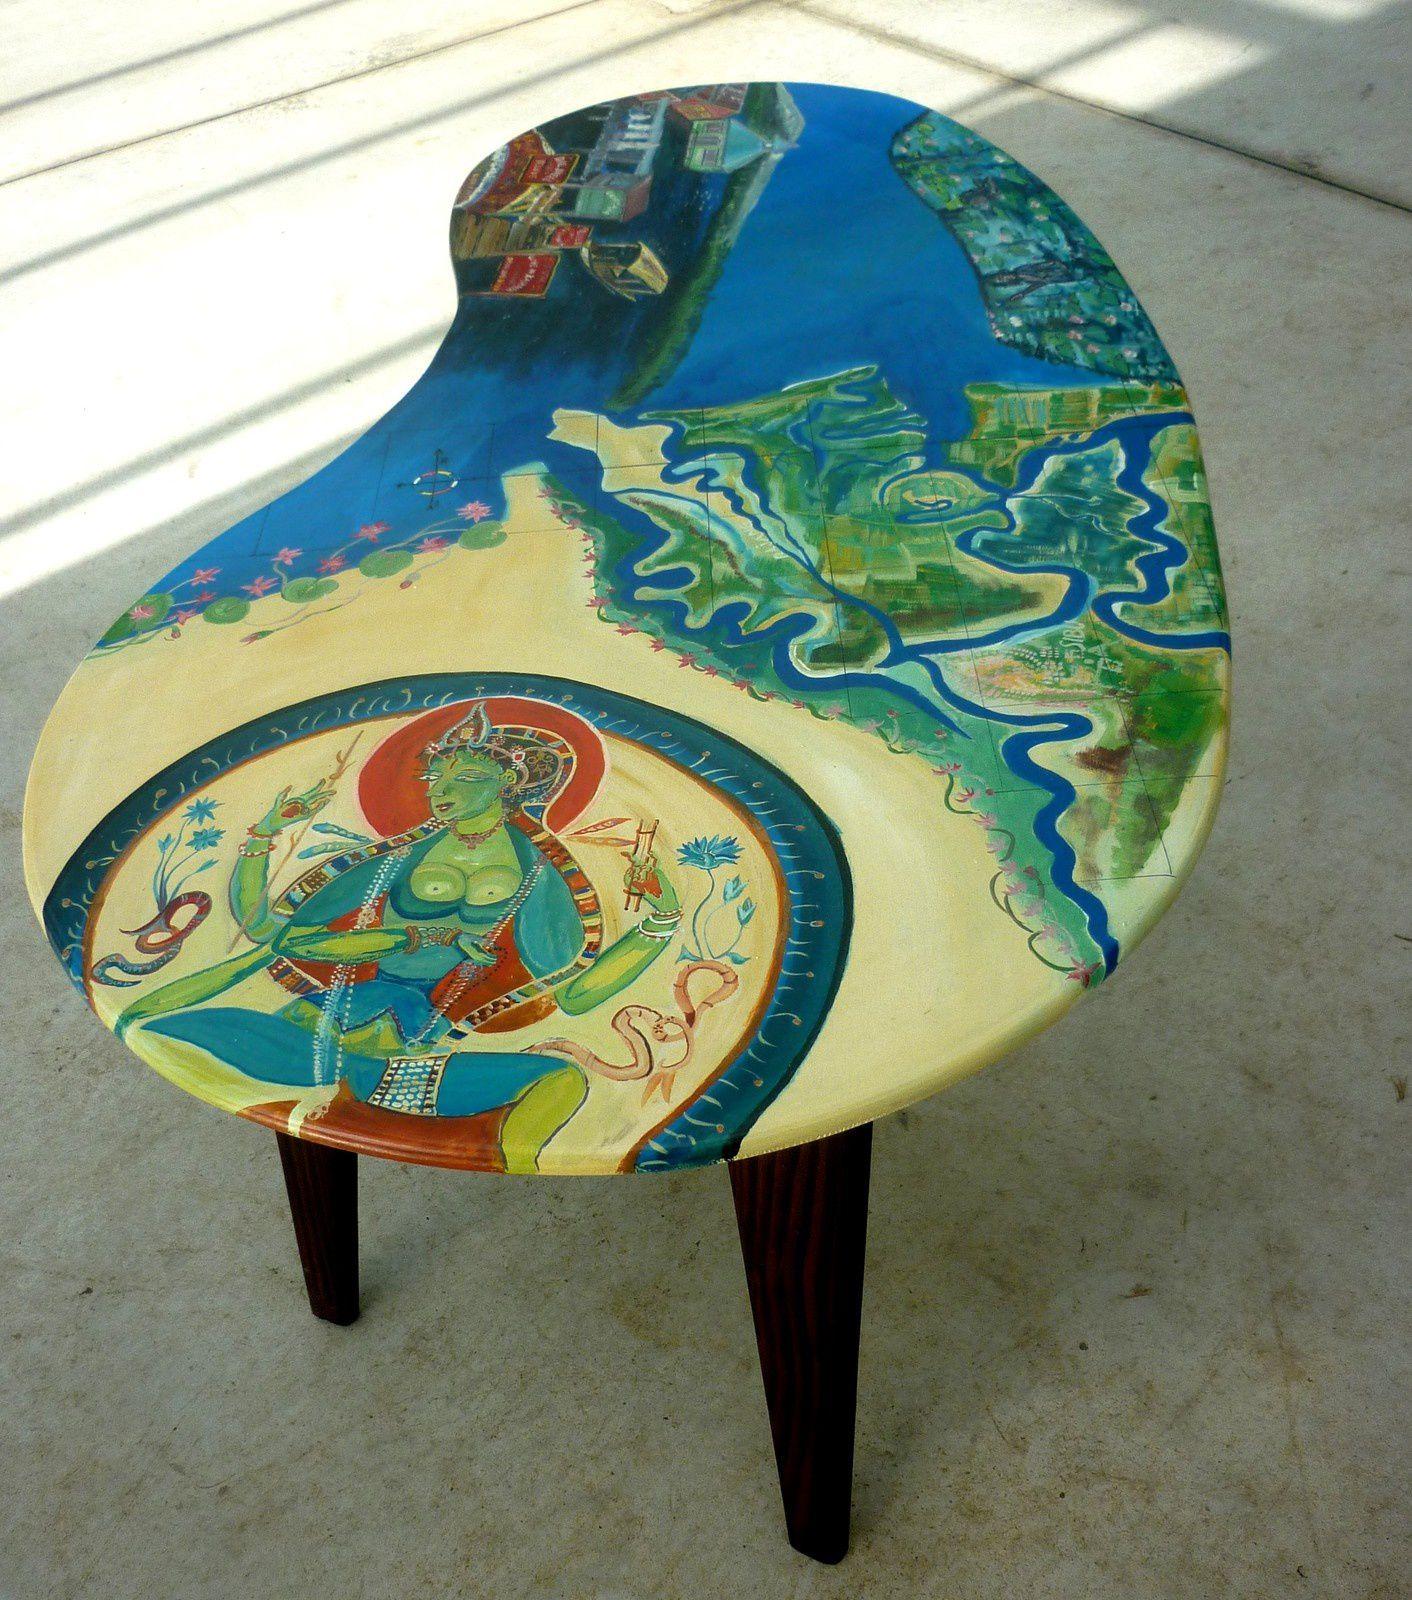 Carnet de voyage le blog de yuta atelier ar zan - Peinture a la caseine ...